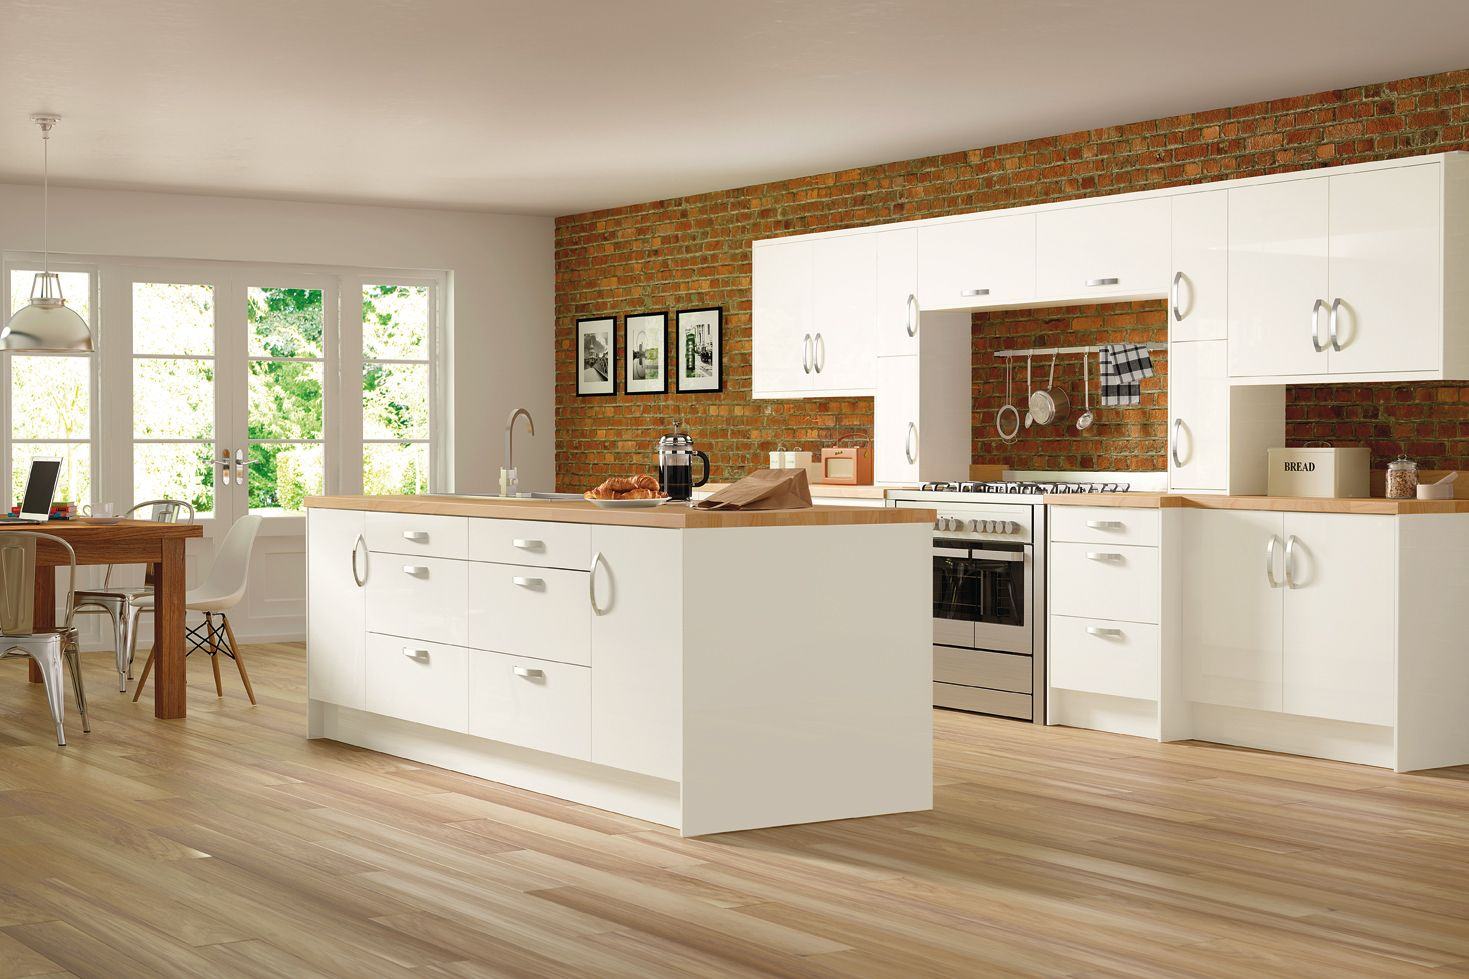 Trieste Gloss White Rixonway Kitchens Timeless kitchen